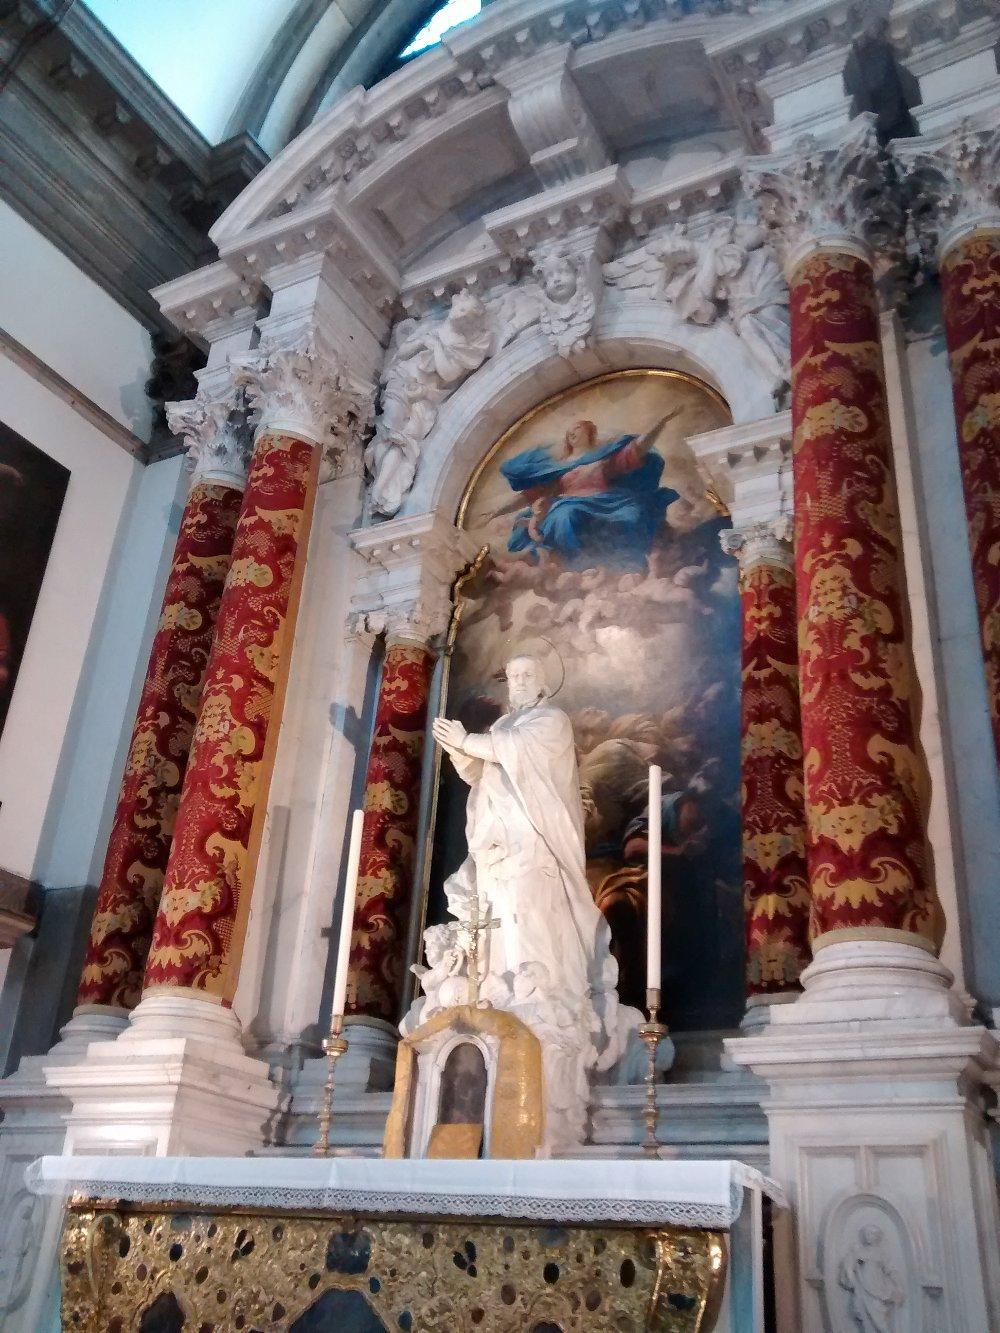 Altar inside Santa Maria Della Salute